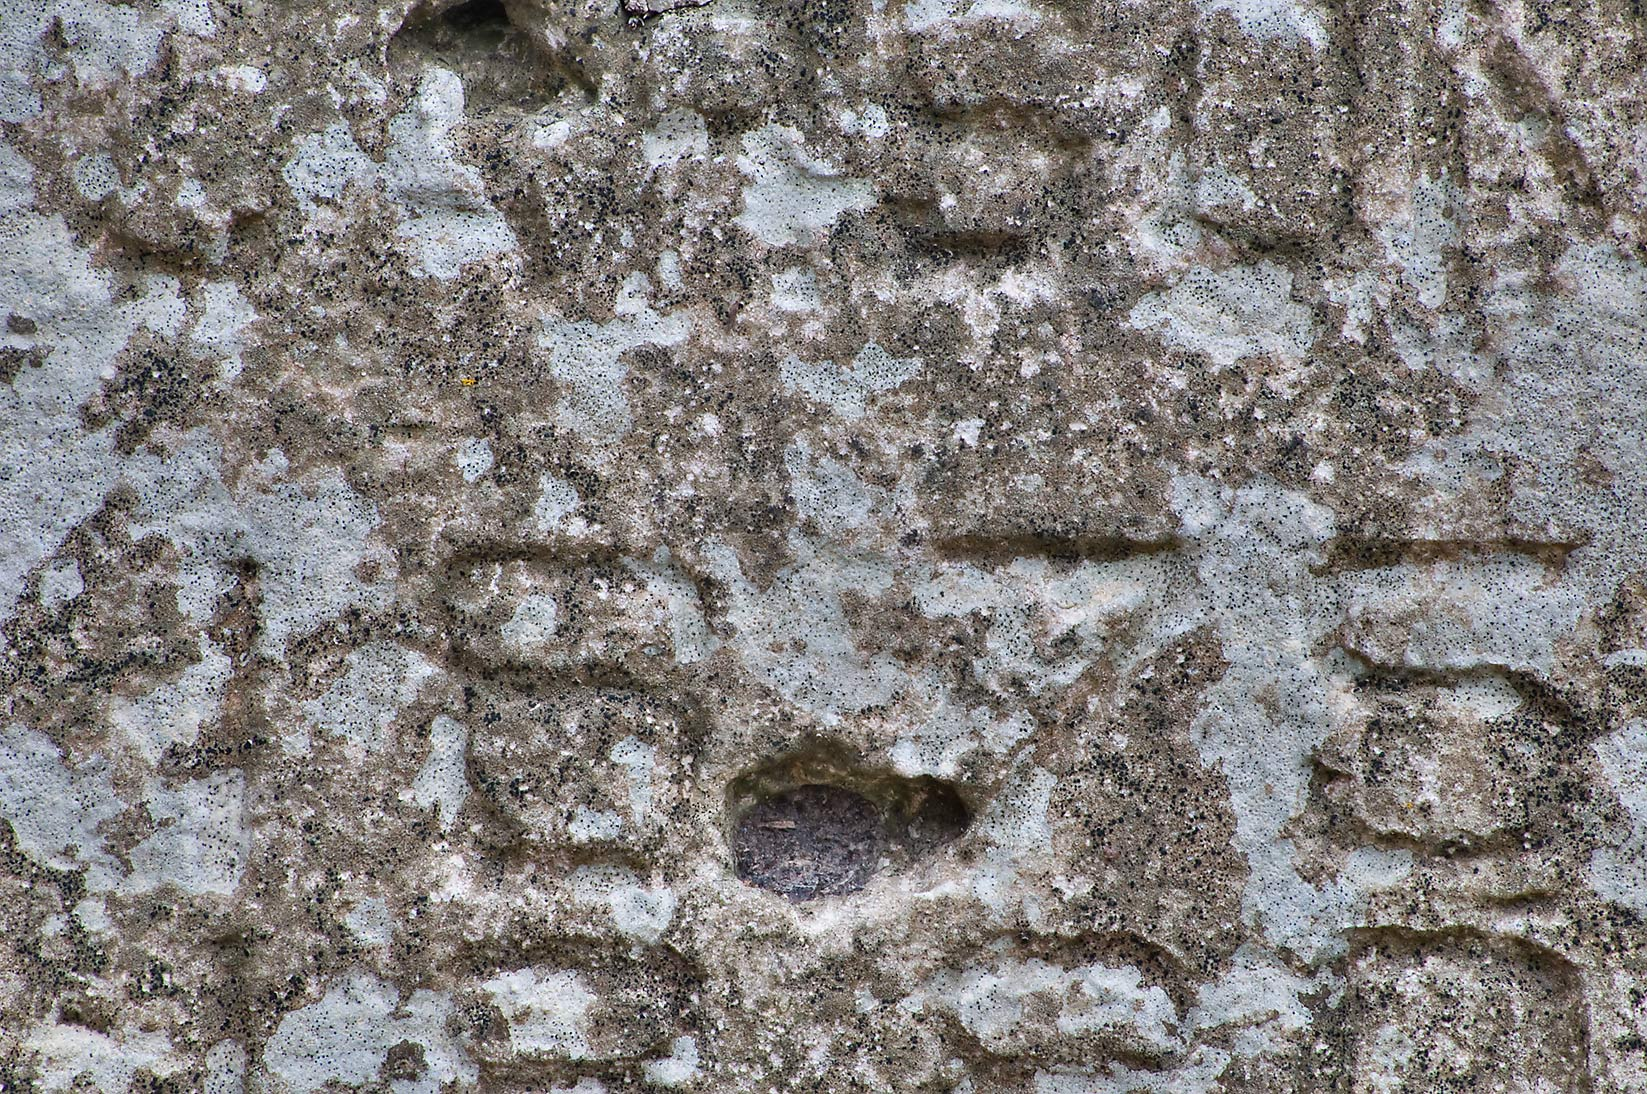 Headstone texture in boonville cemetery bryan texas december 17